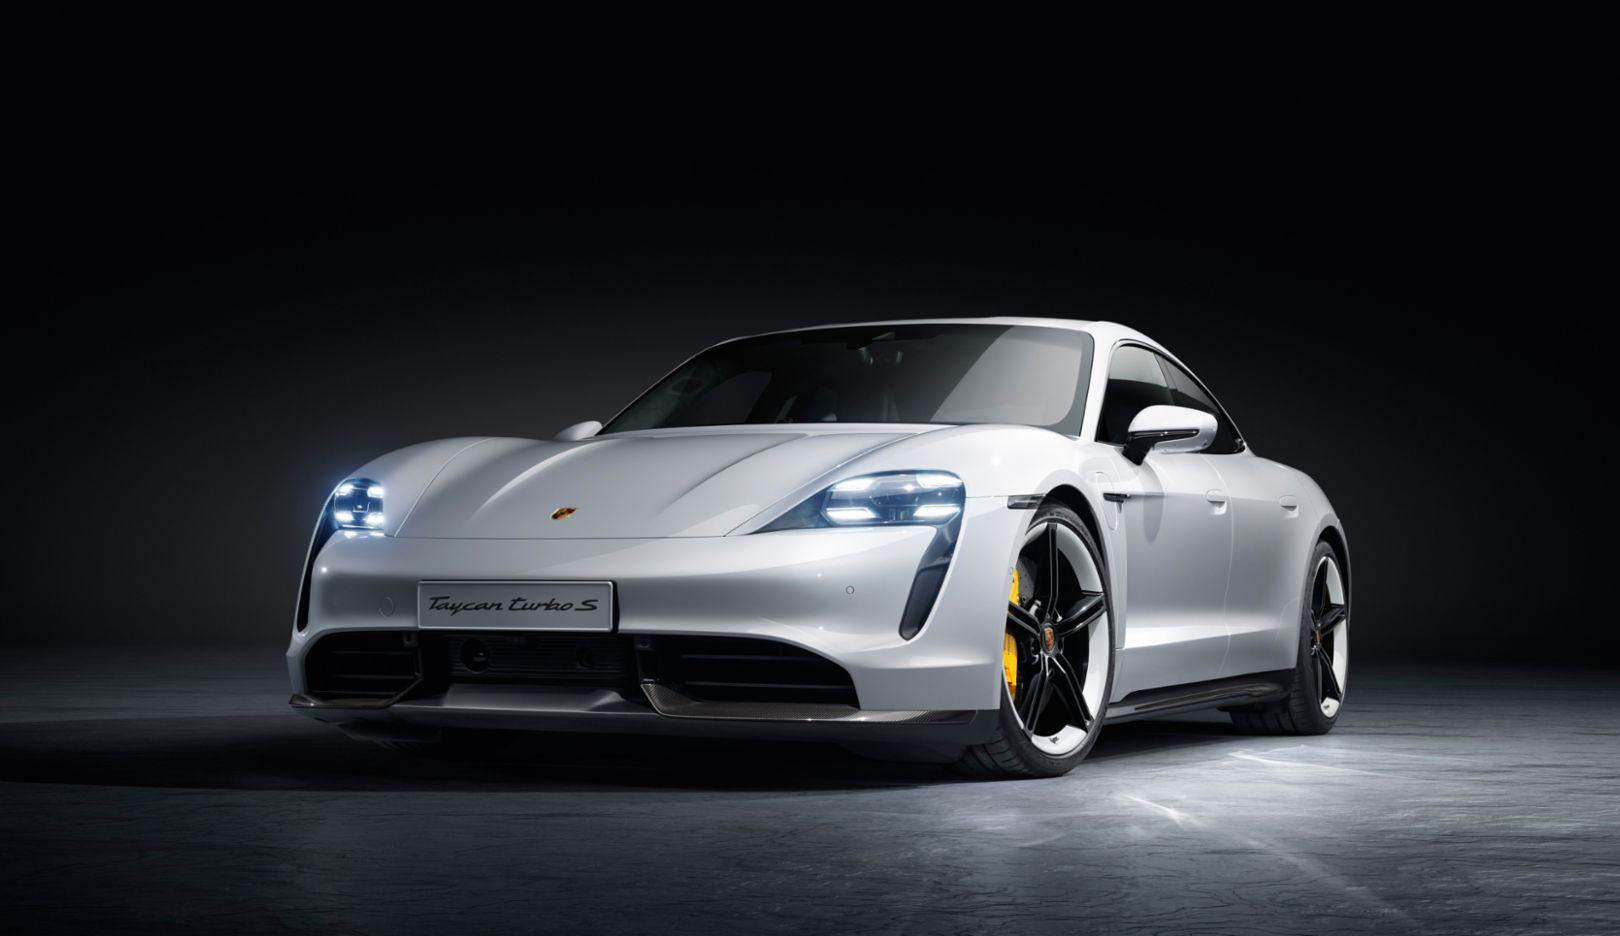 The Exterior Design Pure New Design With Porsche Dna